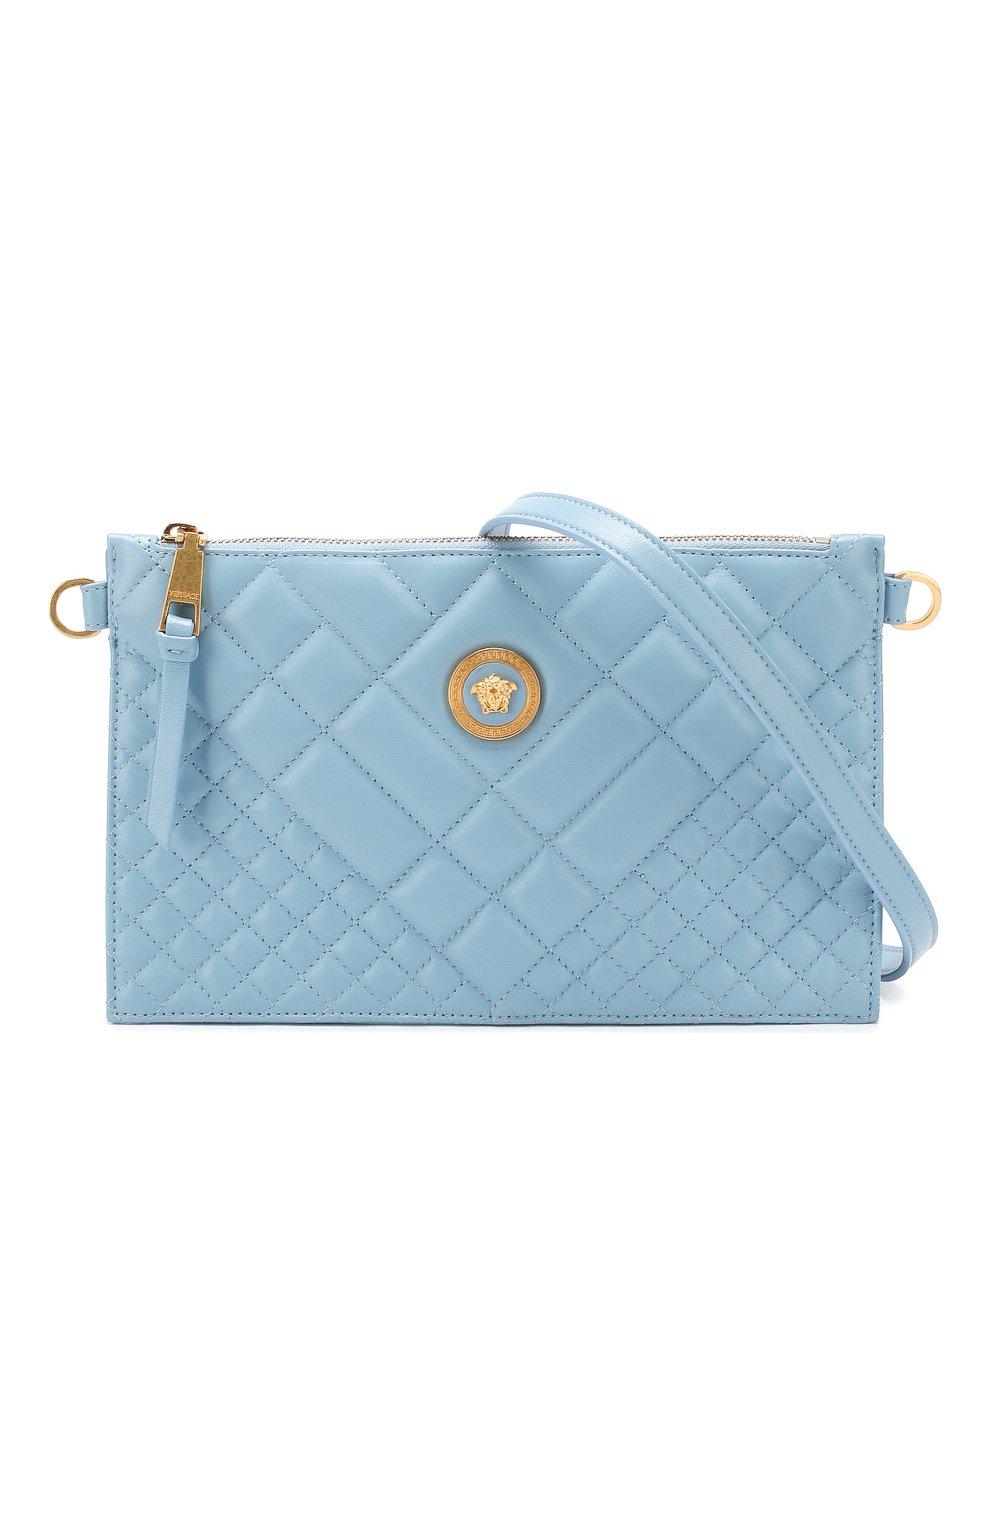 Сумка Quilted Versace голубая цвета   Фото №6